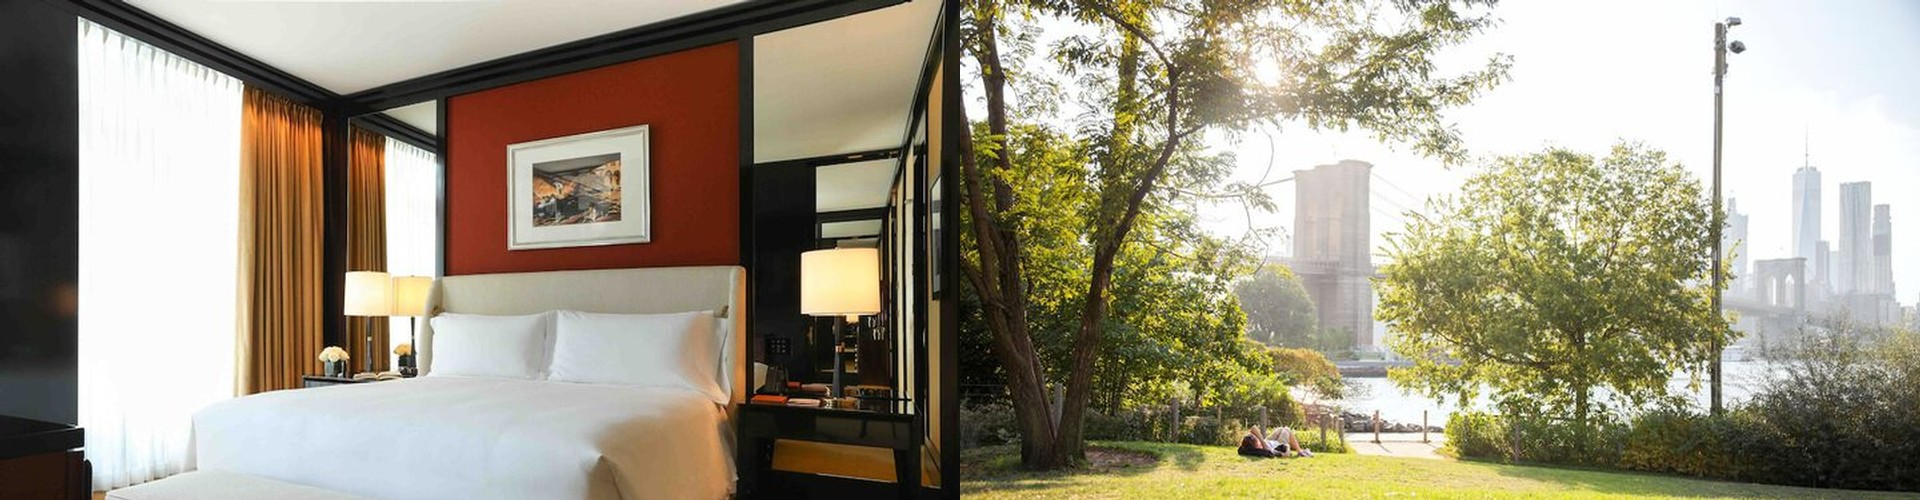 Best New York City Wedding Hotels